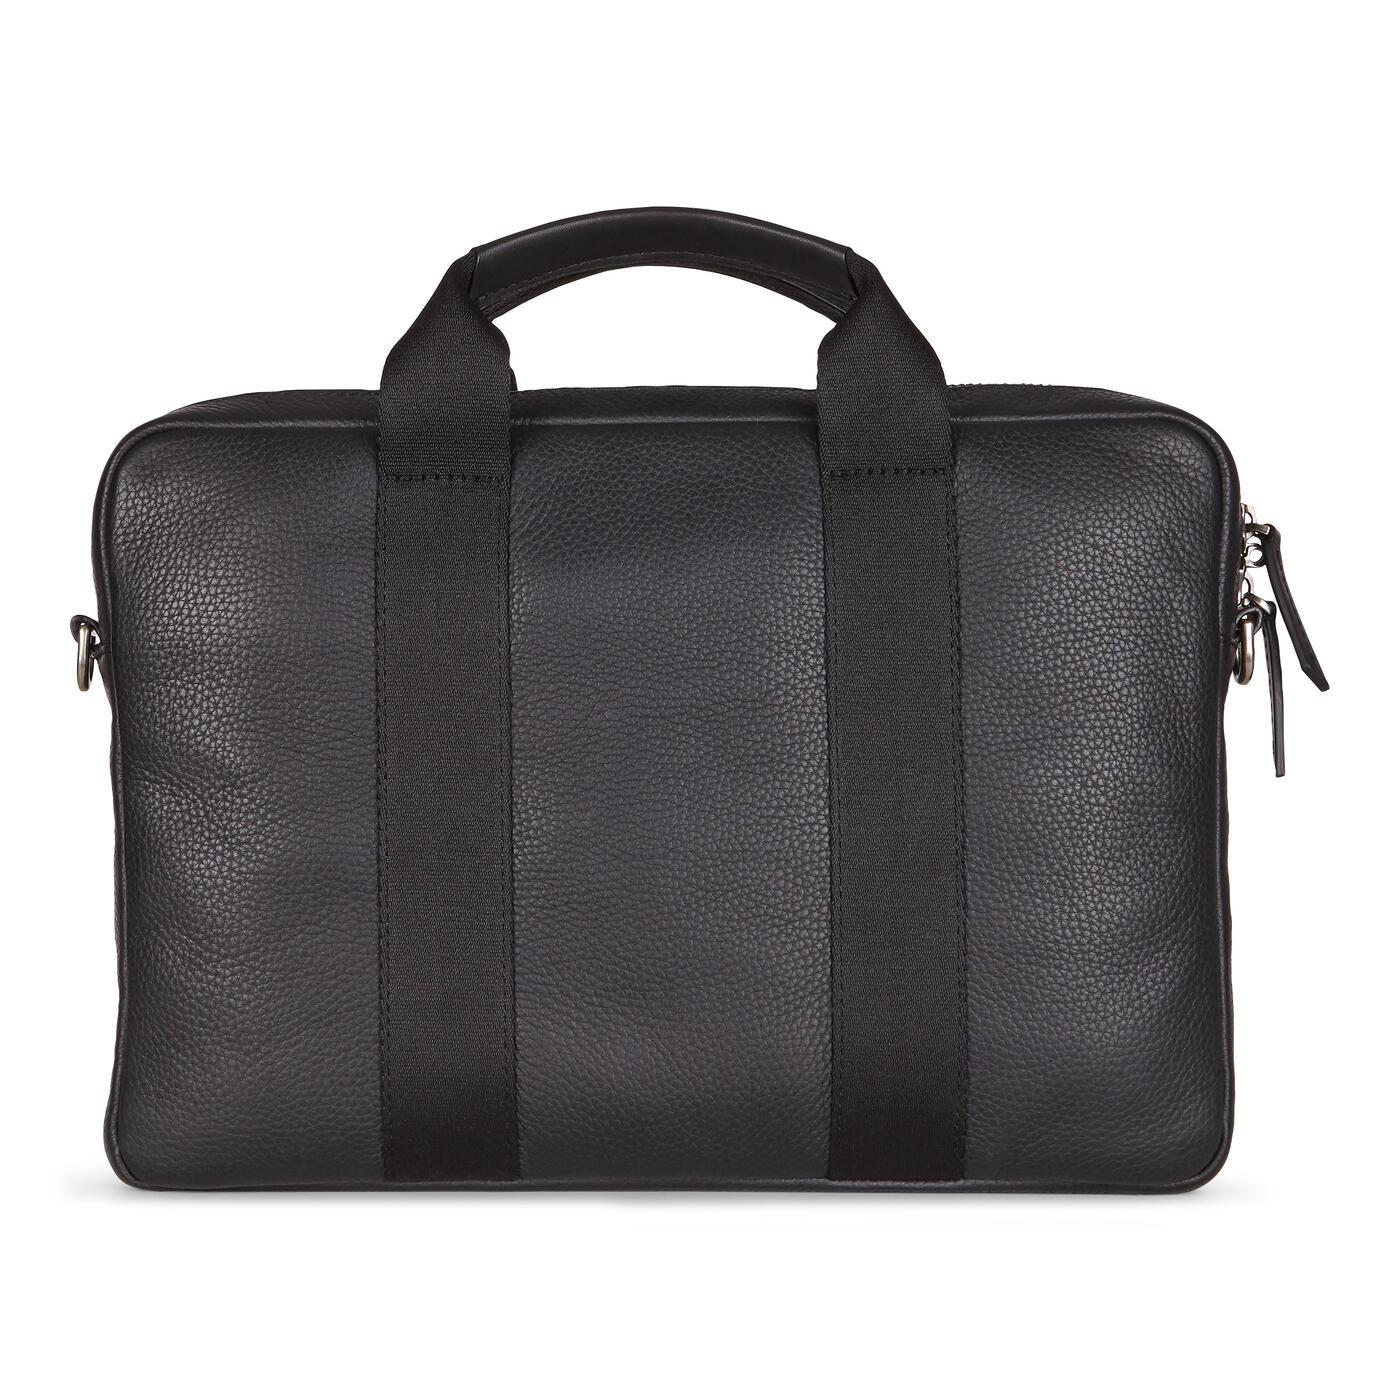 ECCO Sune Folio Business Bag